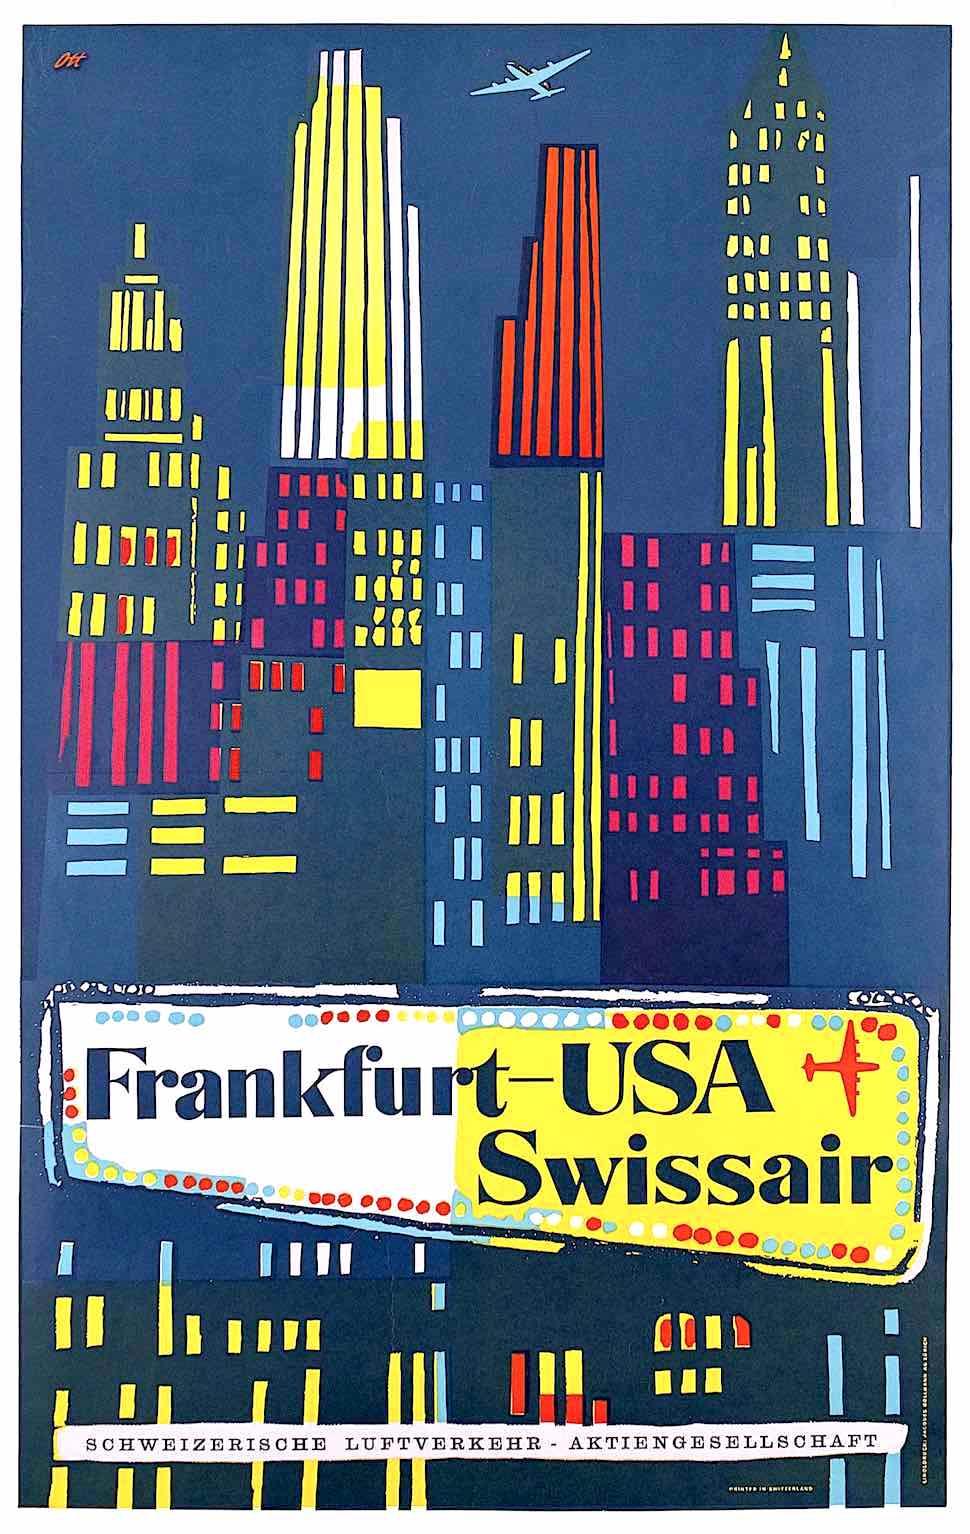 a Henri Ott 1951 poster for Swissair